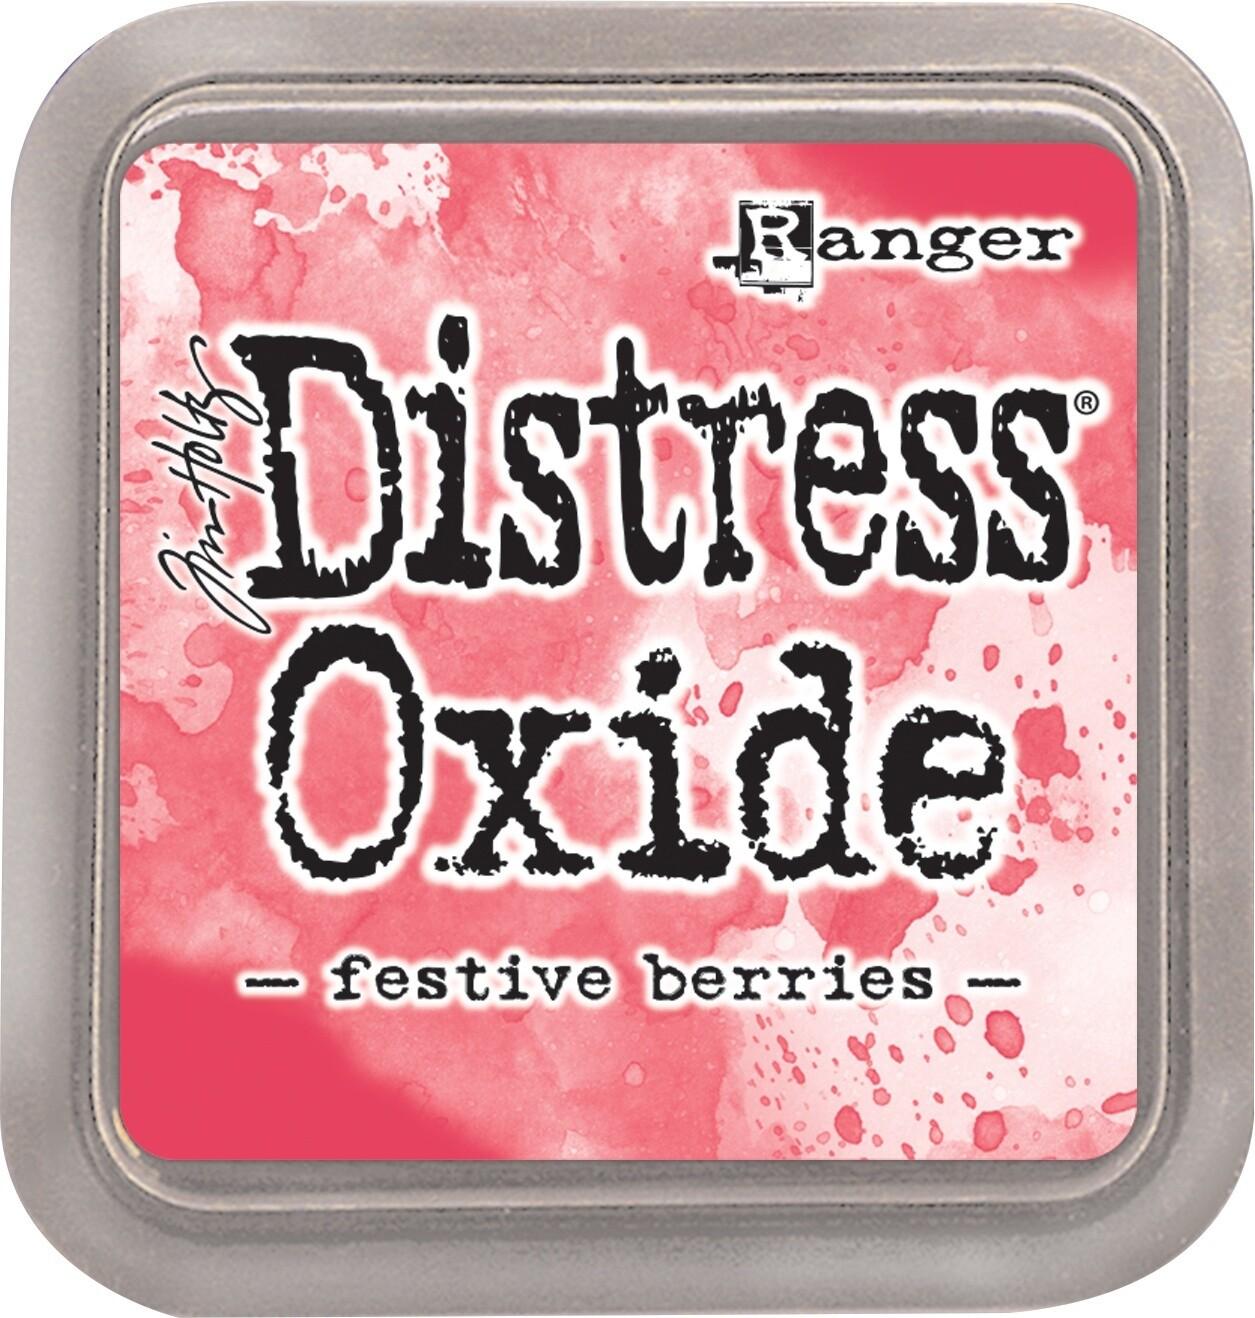 Tim Holtz Distress FESTIVE BERRIES Oxides Ink Pad